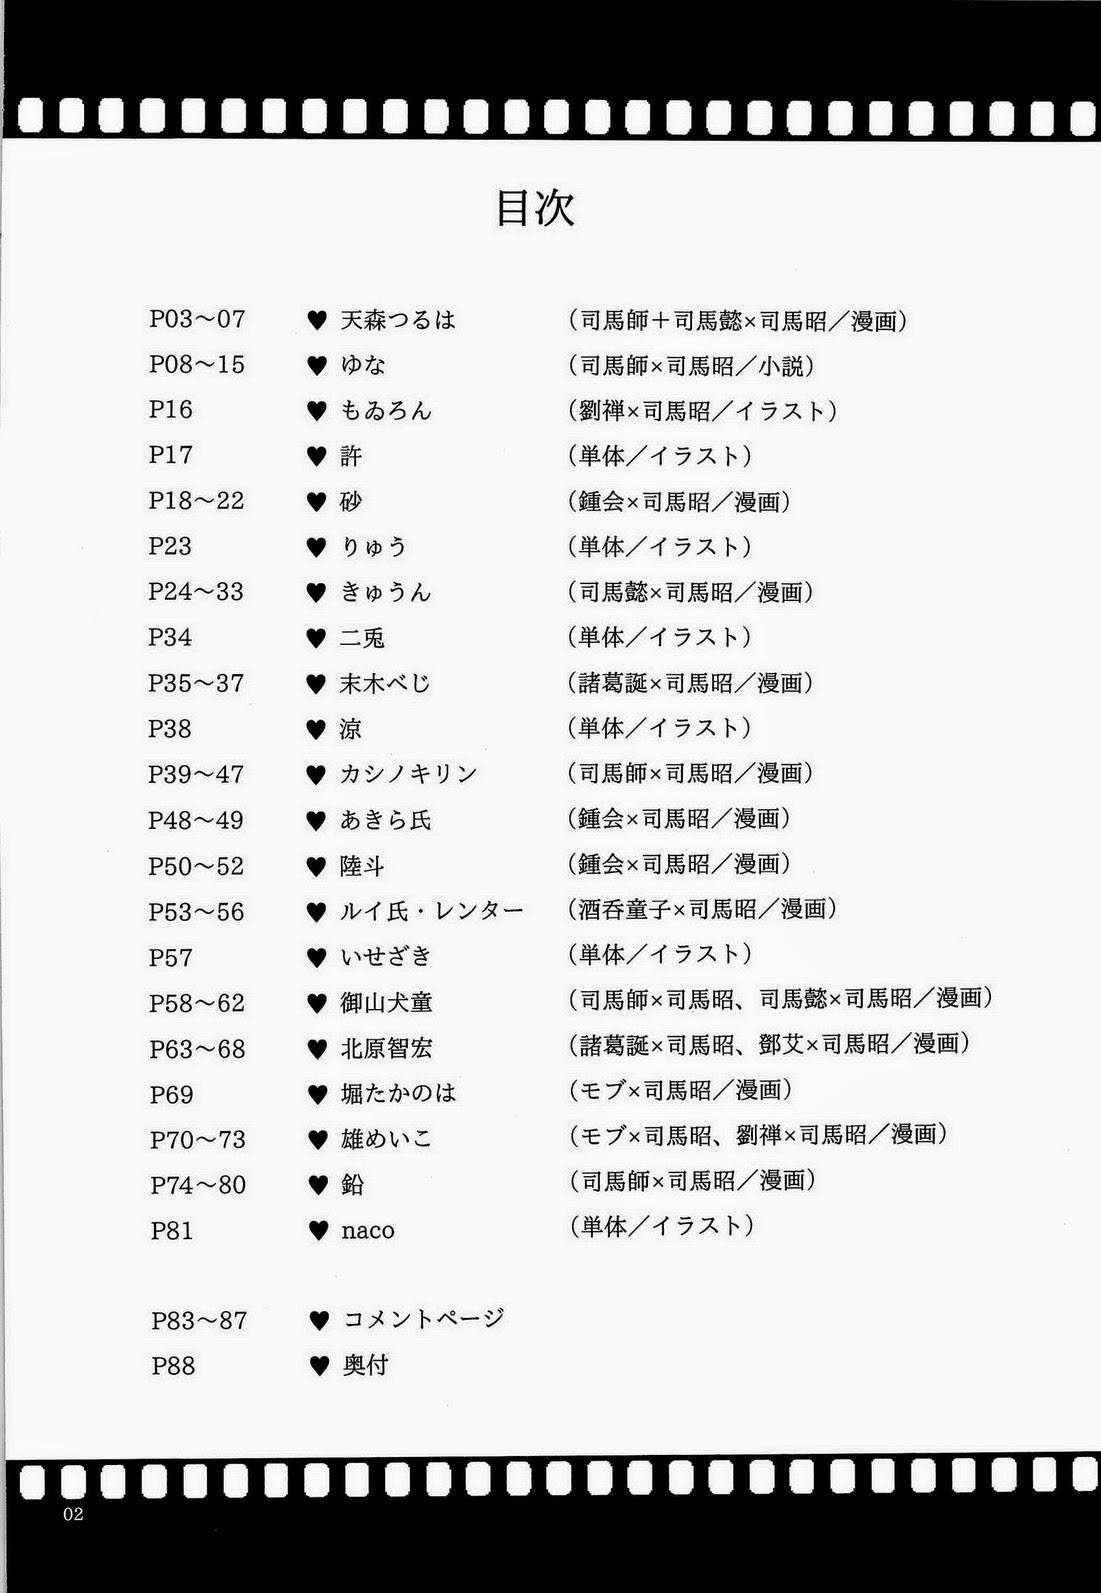 Shiba ShowTime 4